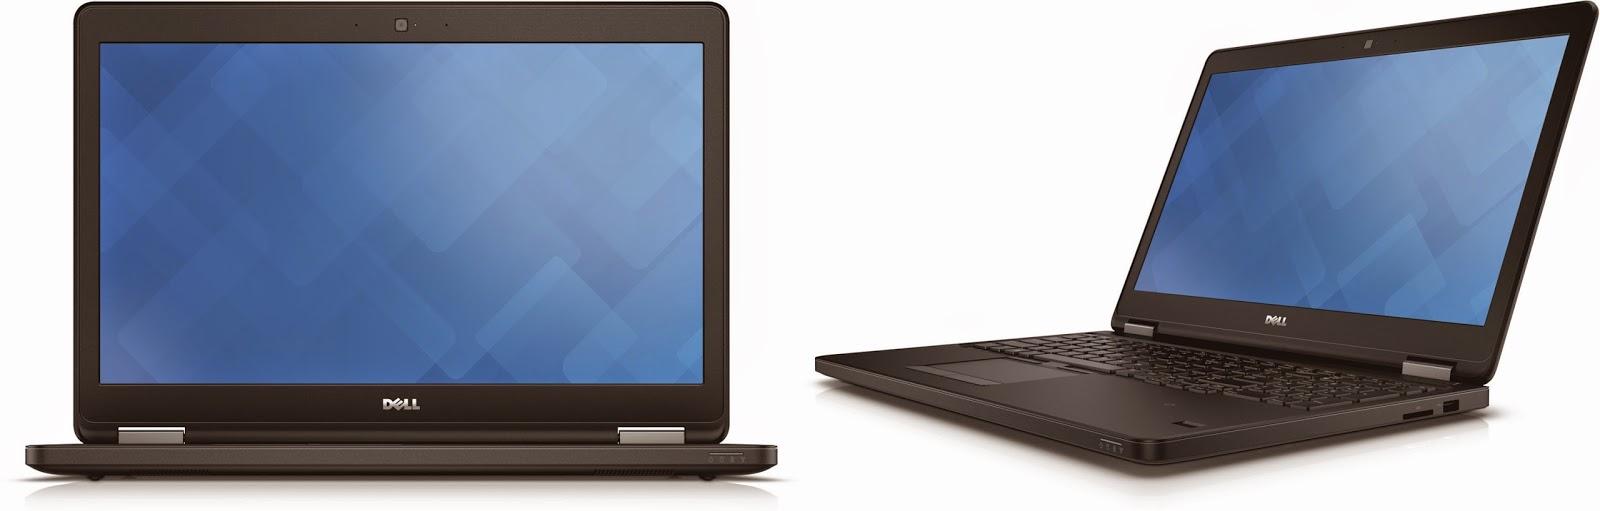 Dell Latitude E5550/5550 Drivers Support Download - Download Center